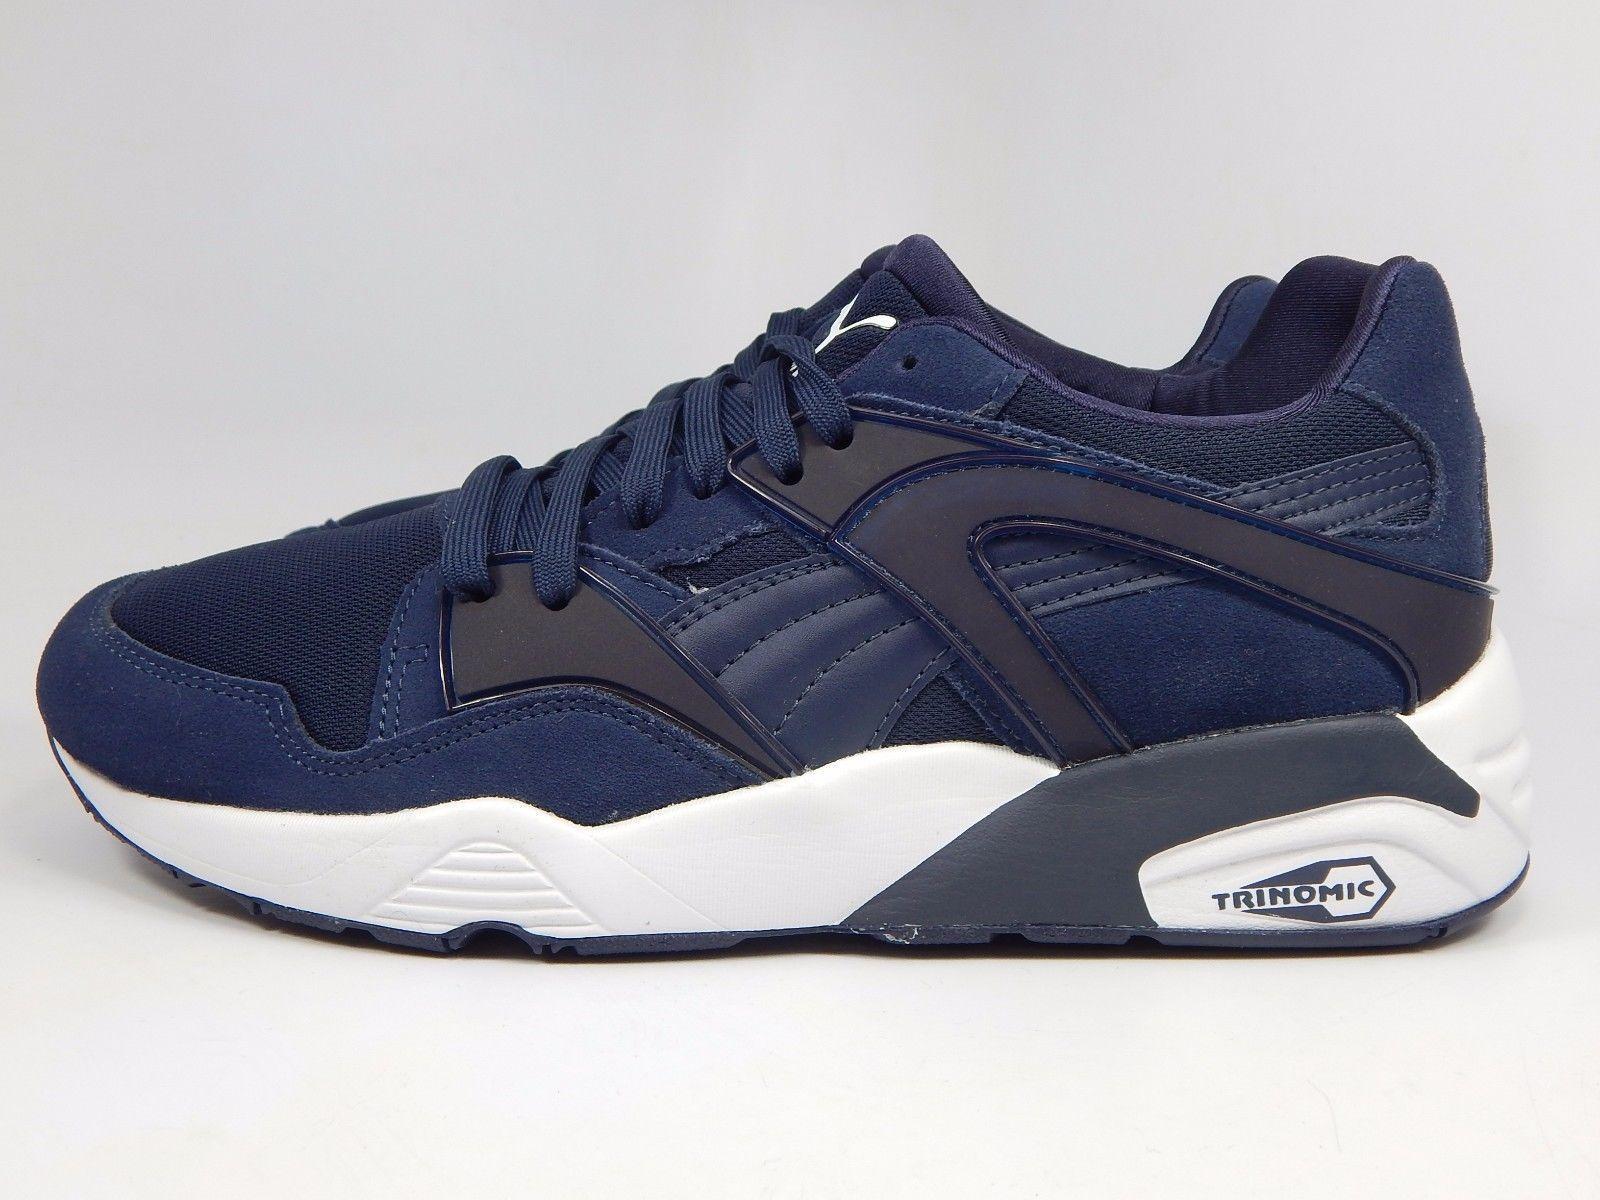 Puma Blaze Men's Running Shoes Size US 10 M (D) EU 43 Peacoat Blue 36013503